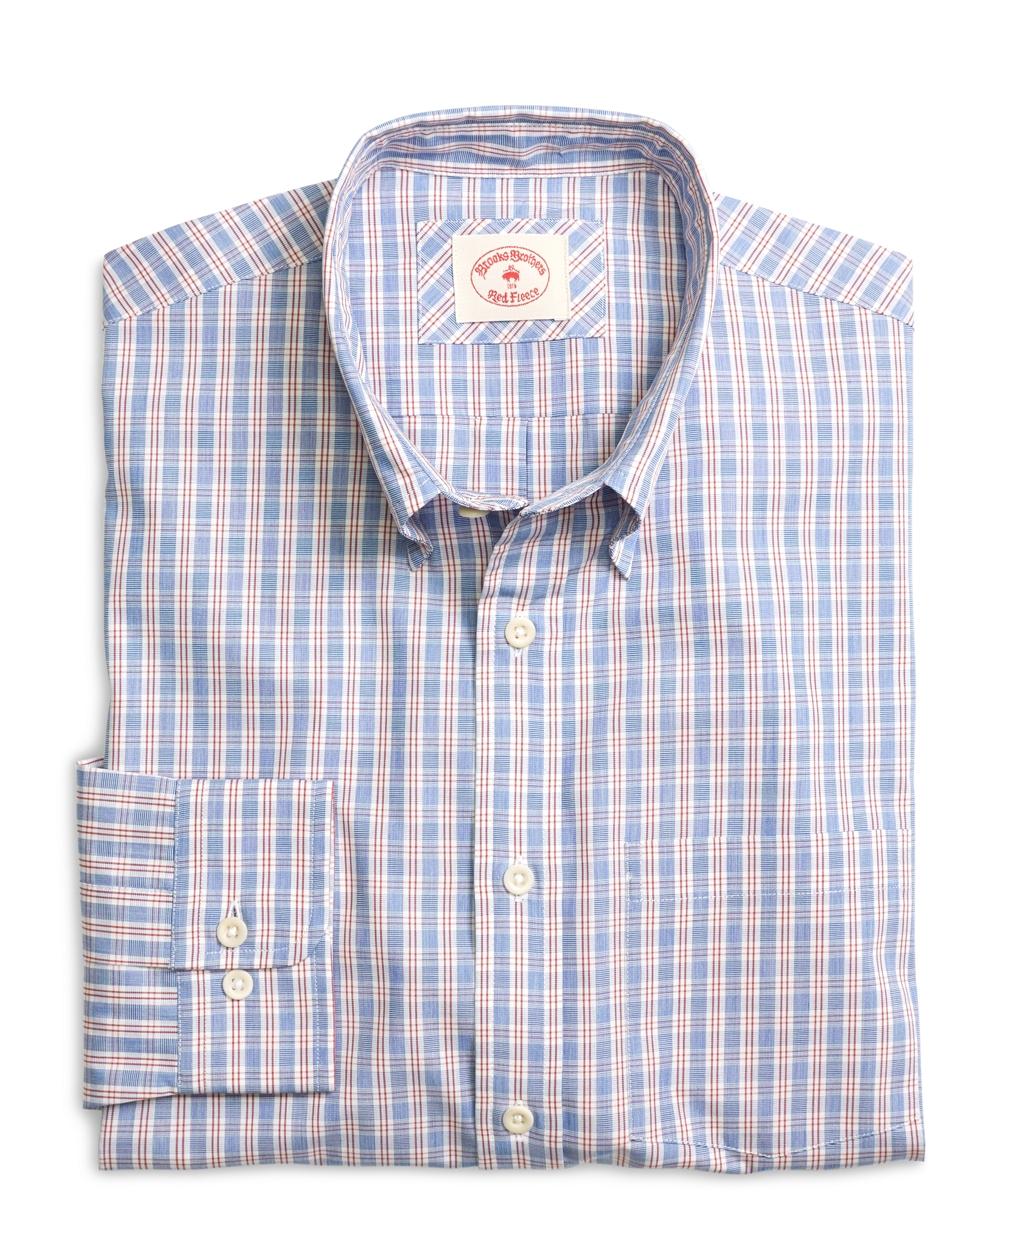 Brooks brothers white organic cotton check sport shirt for Brooks brothers sports shirts